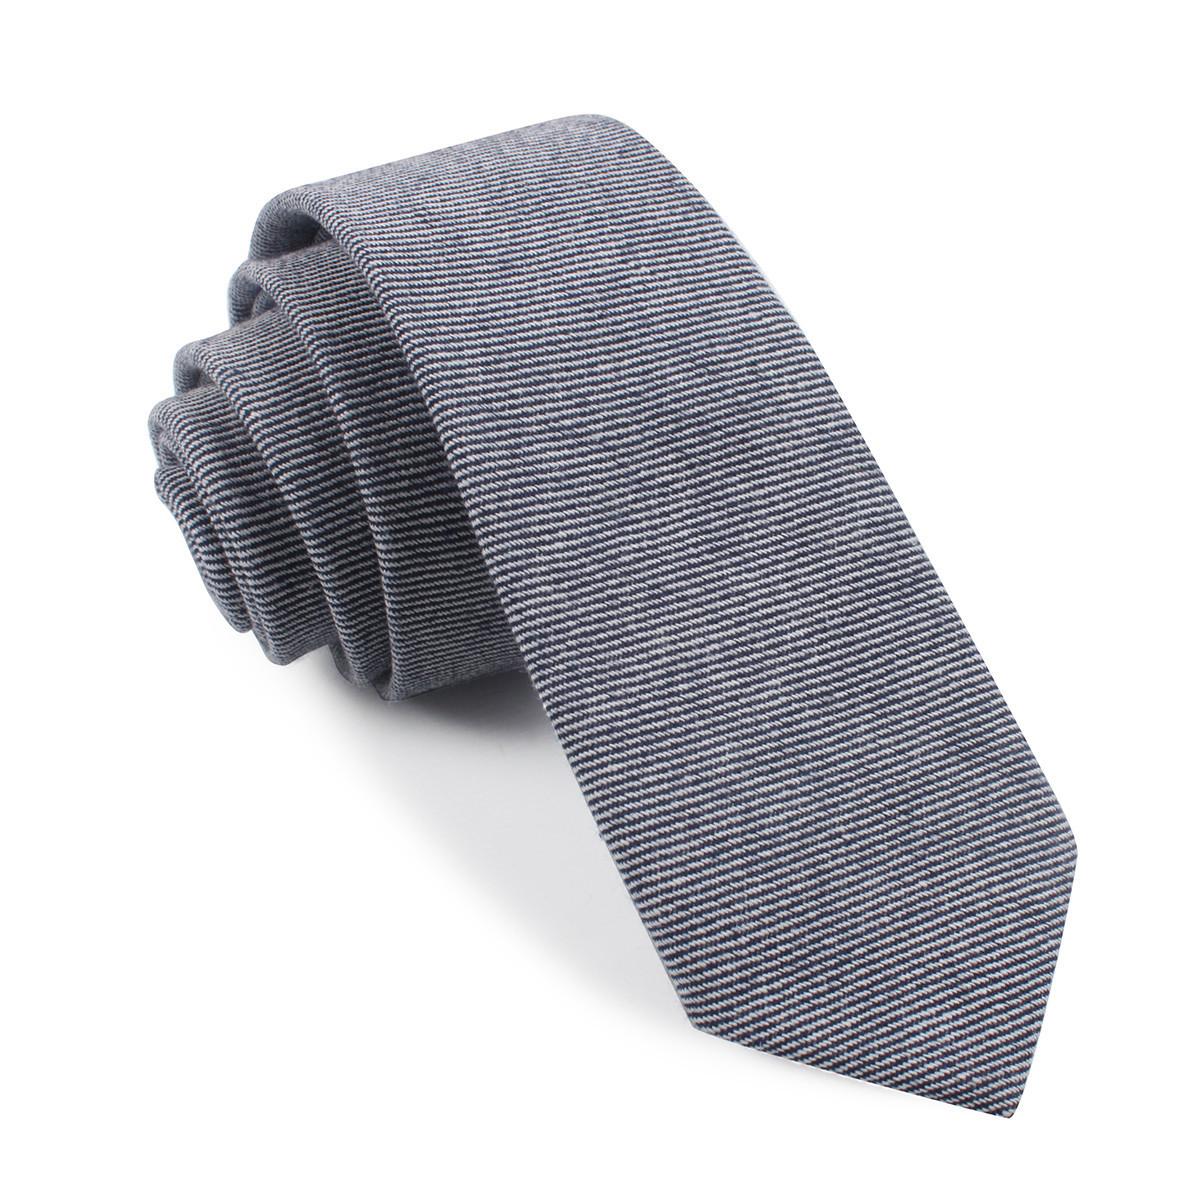 de5a0919ed04 OTAA Navy Blue & White Twill Stripe Linen Skinny Tie. Price: $40.00. Image 1